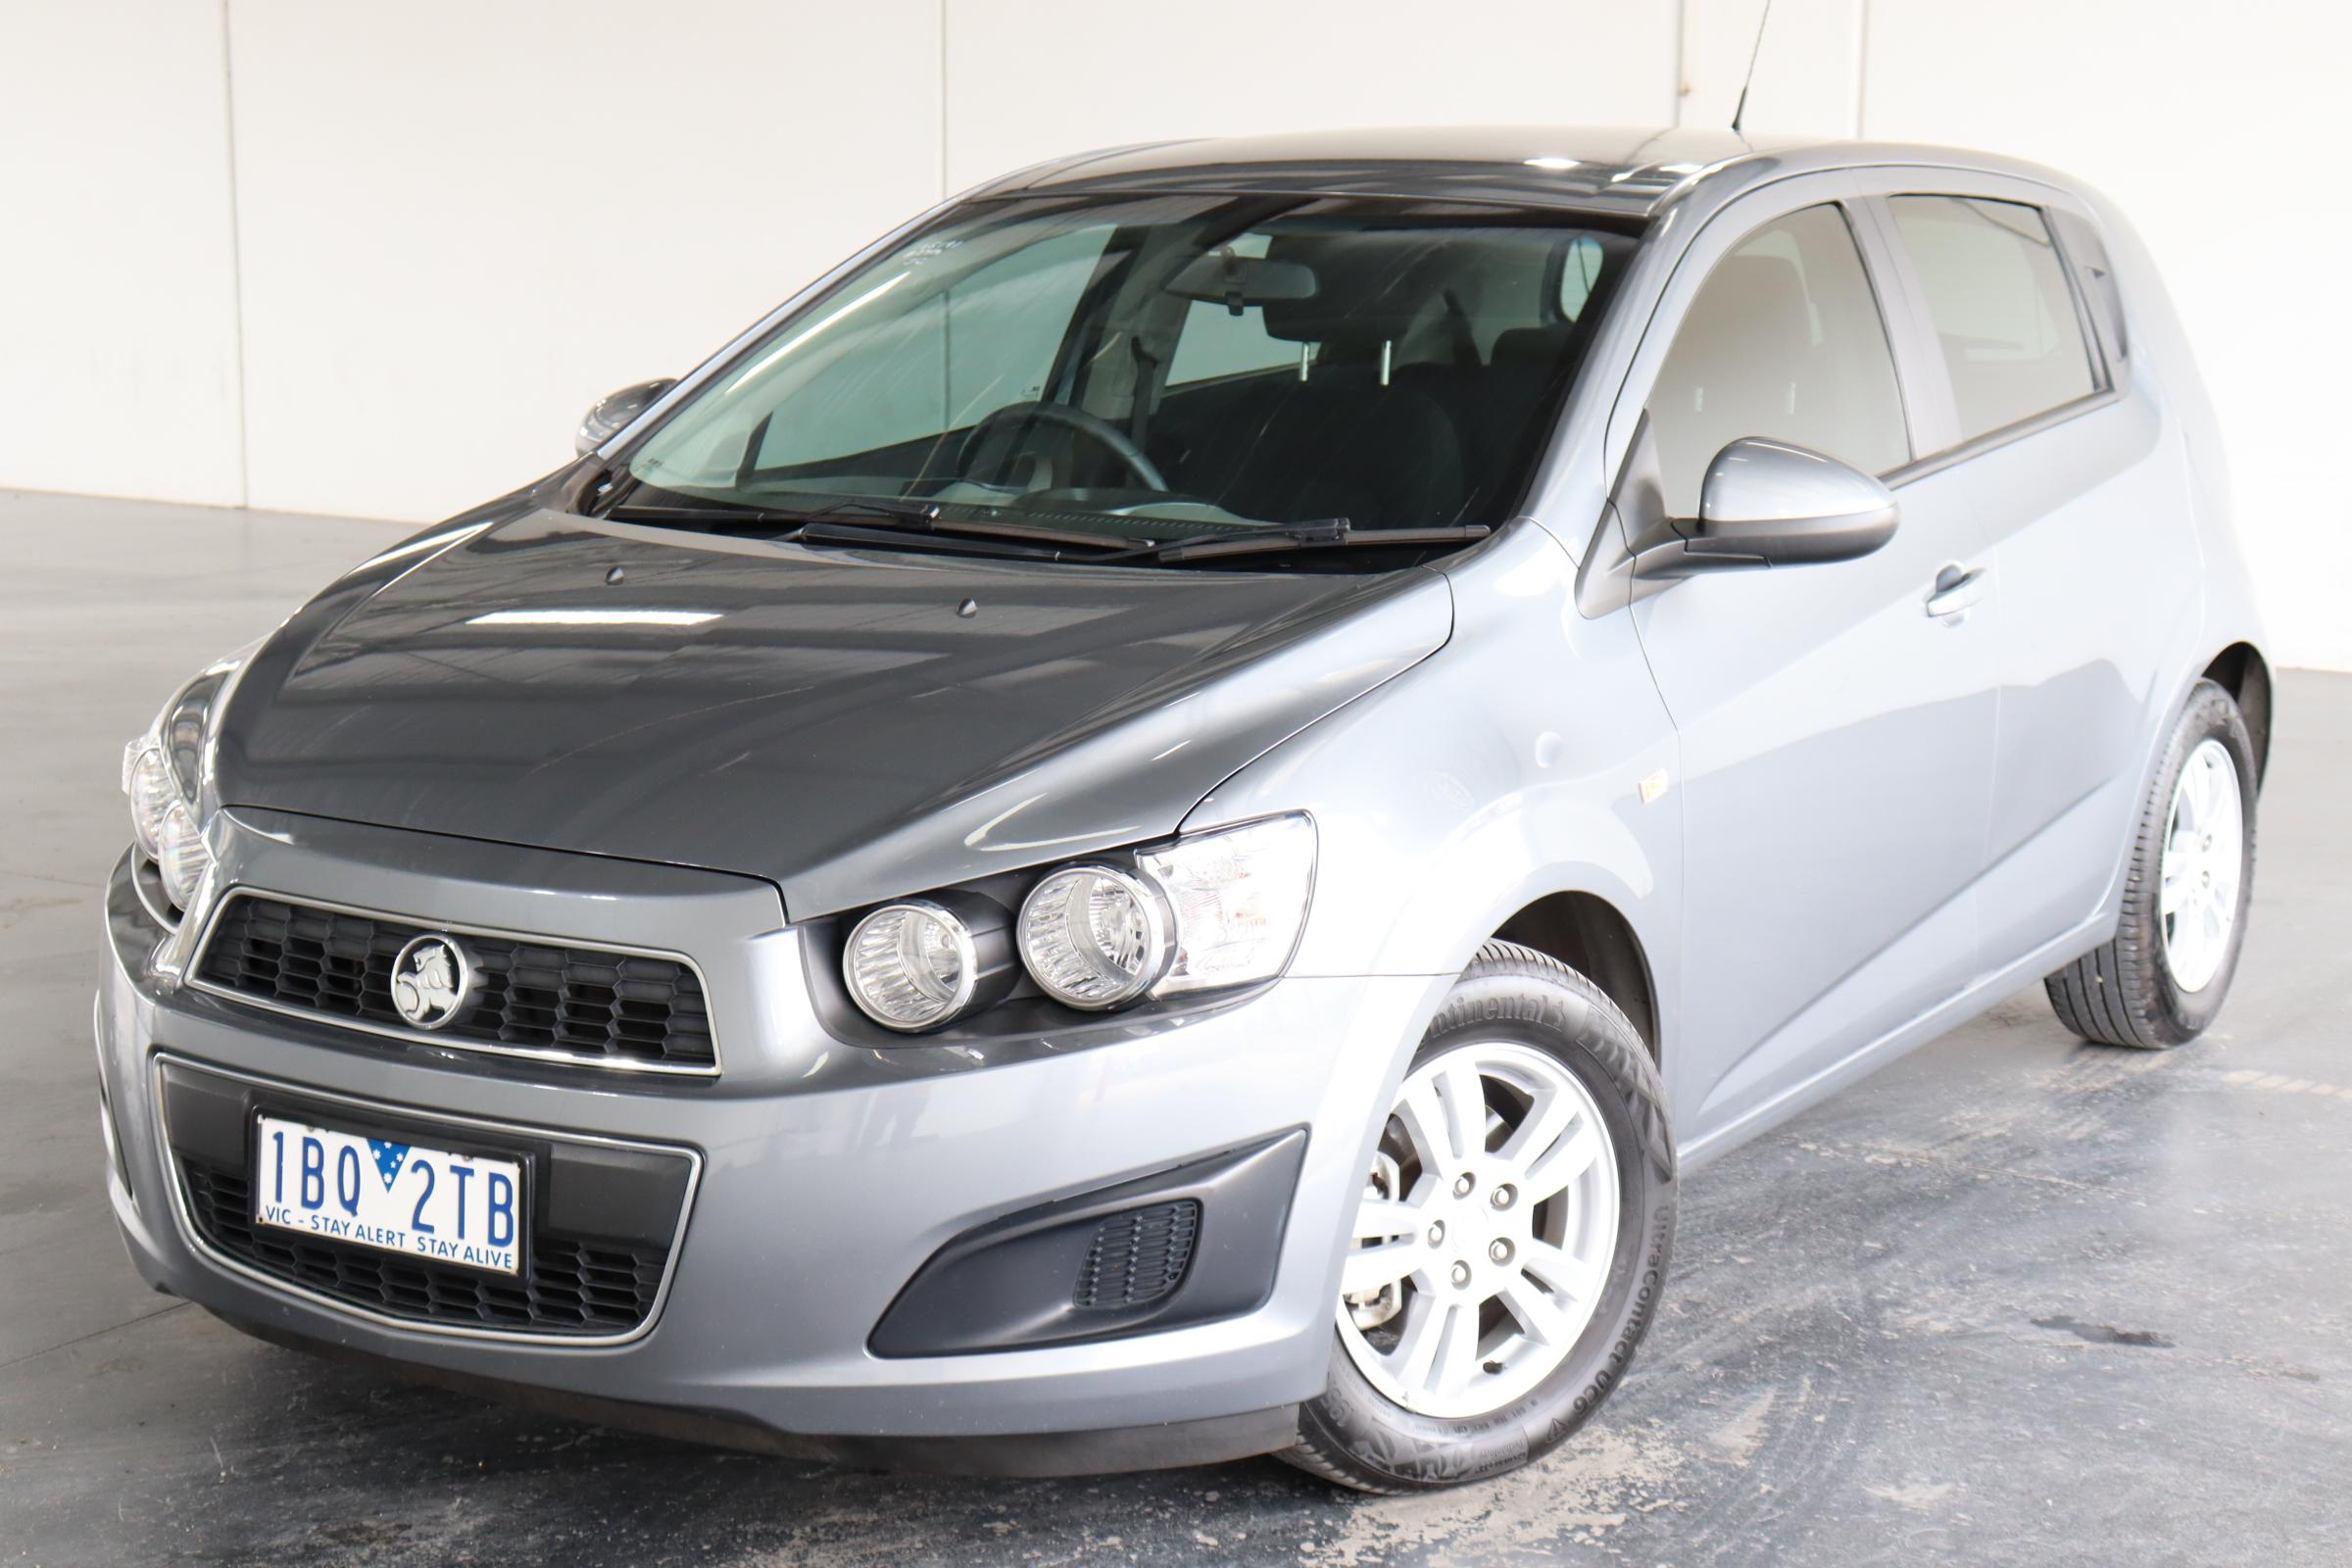 2014 Holden Barina TM Automatic Hatchback